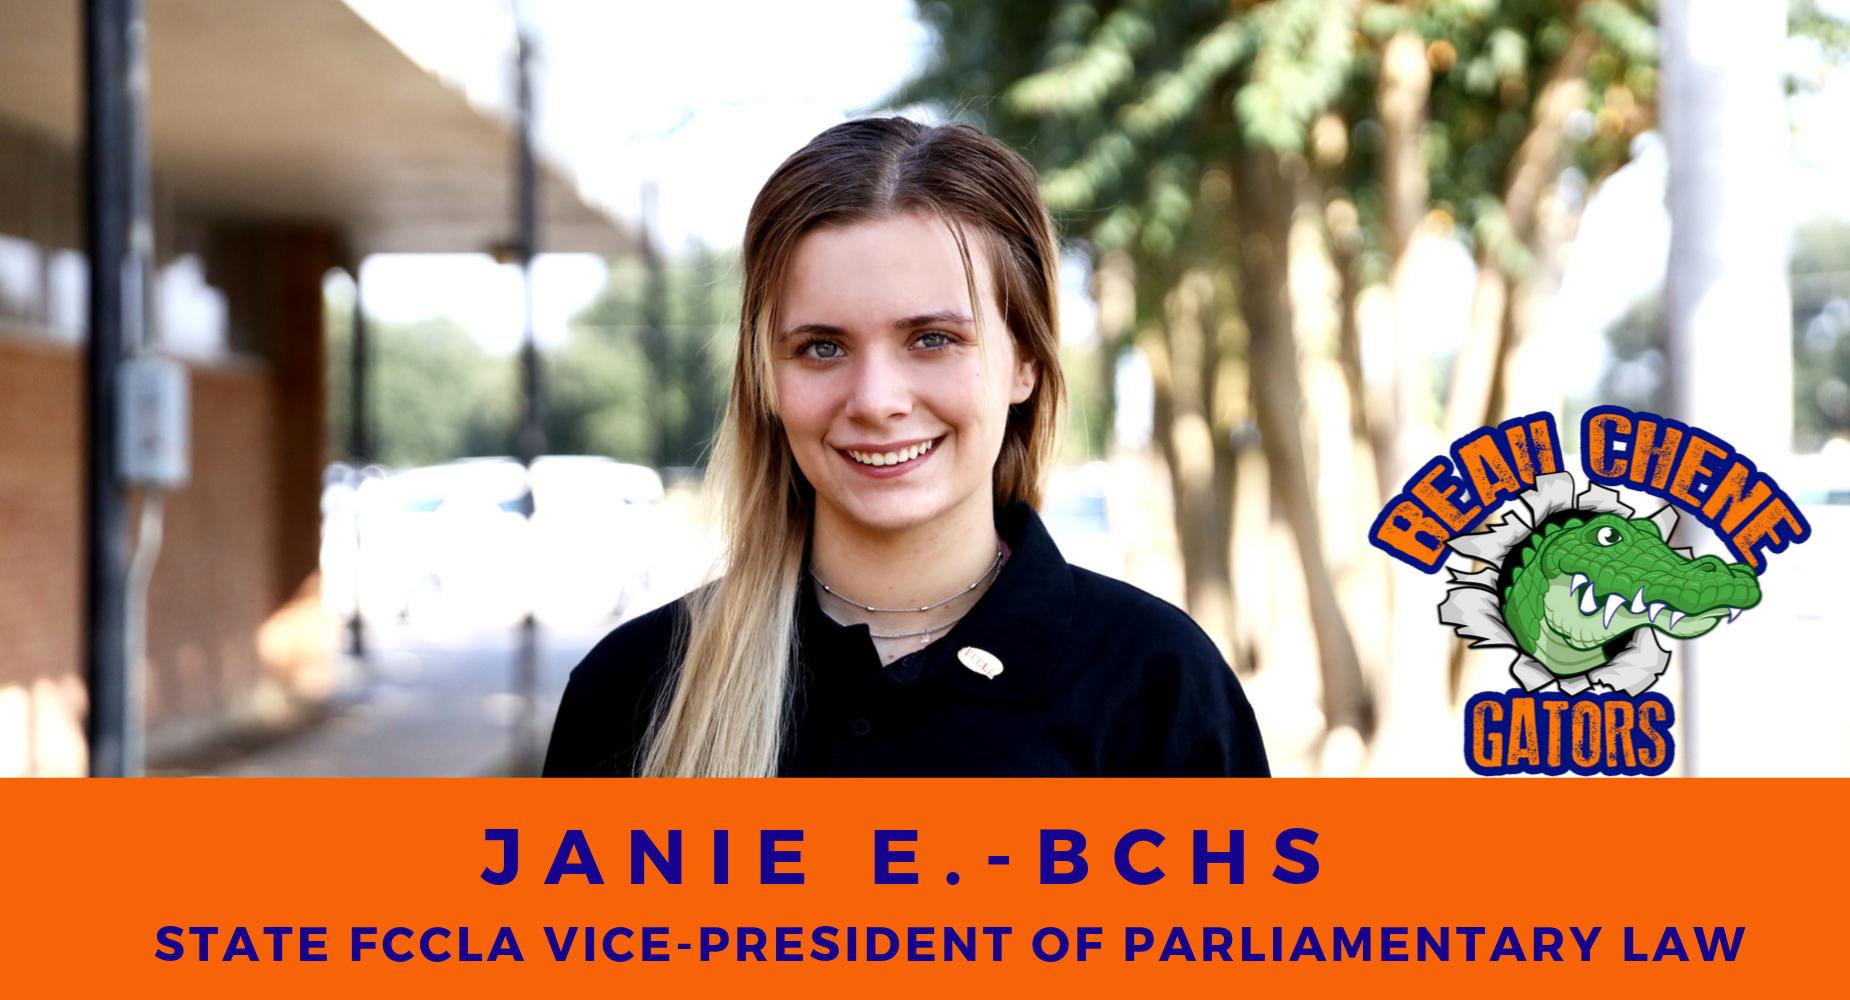 Janie E. - State FCCLA Vice President Of Parliamentarian Law